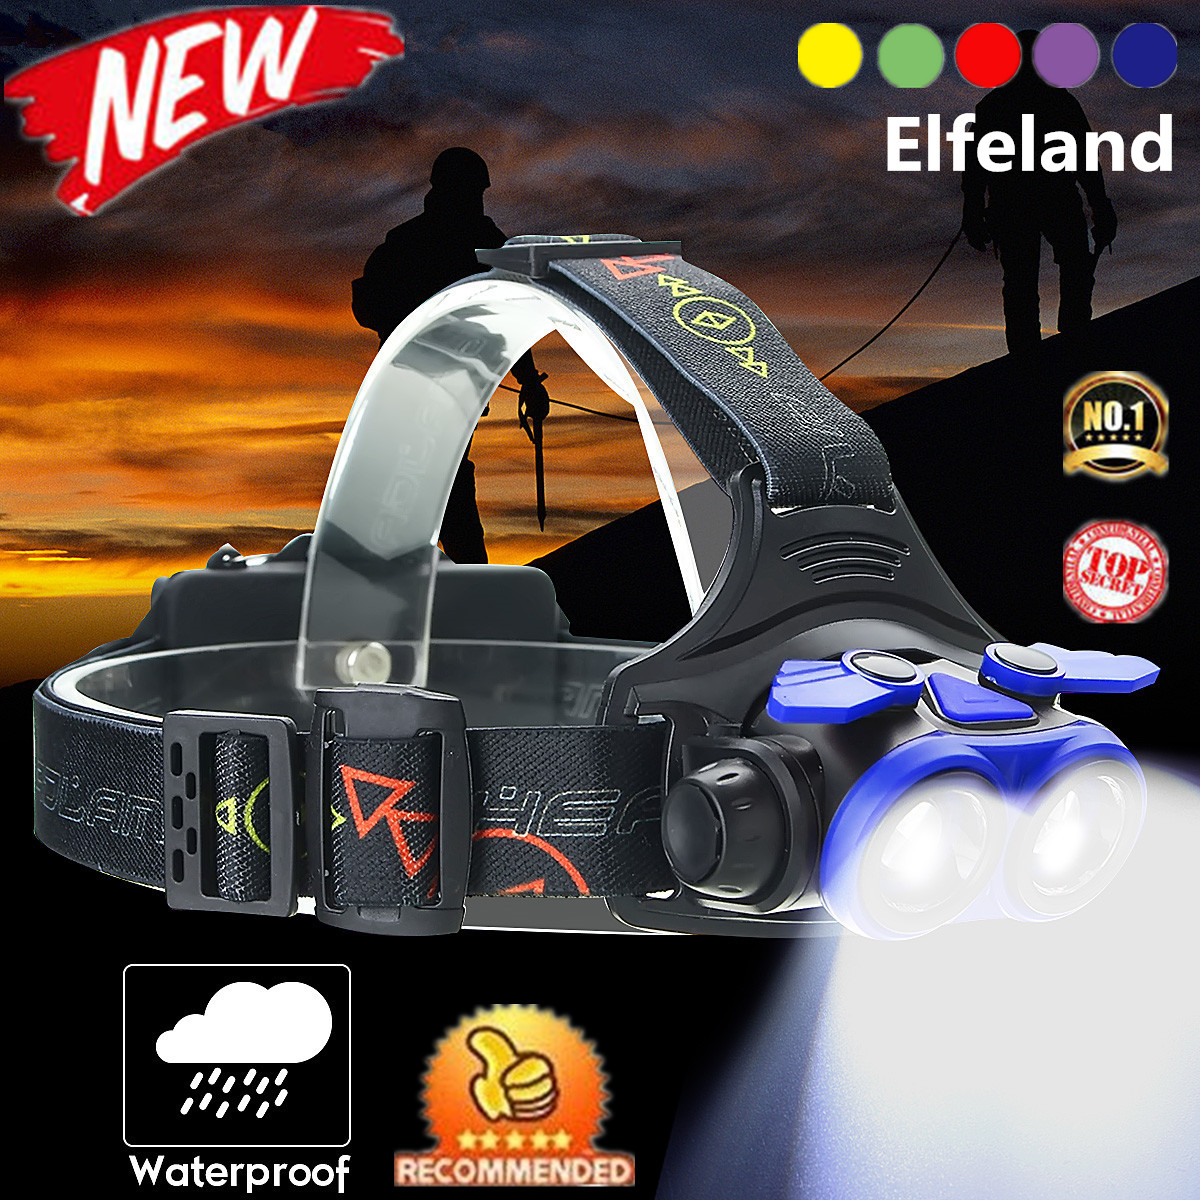 Elfeland 5000 Lumens T6 LED Telescopic Zoom Headlamp Headlight Flashlight Torch Waterproof 4 Modes + USB Cable For Camping Fishing Hiking